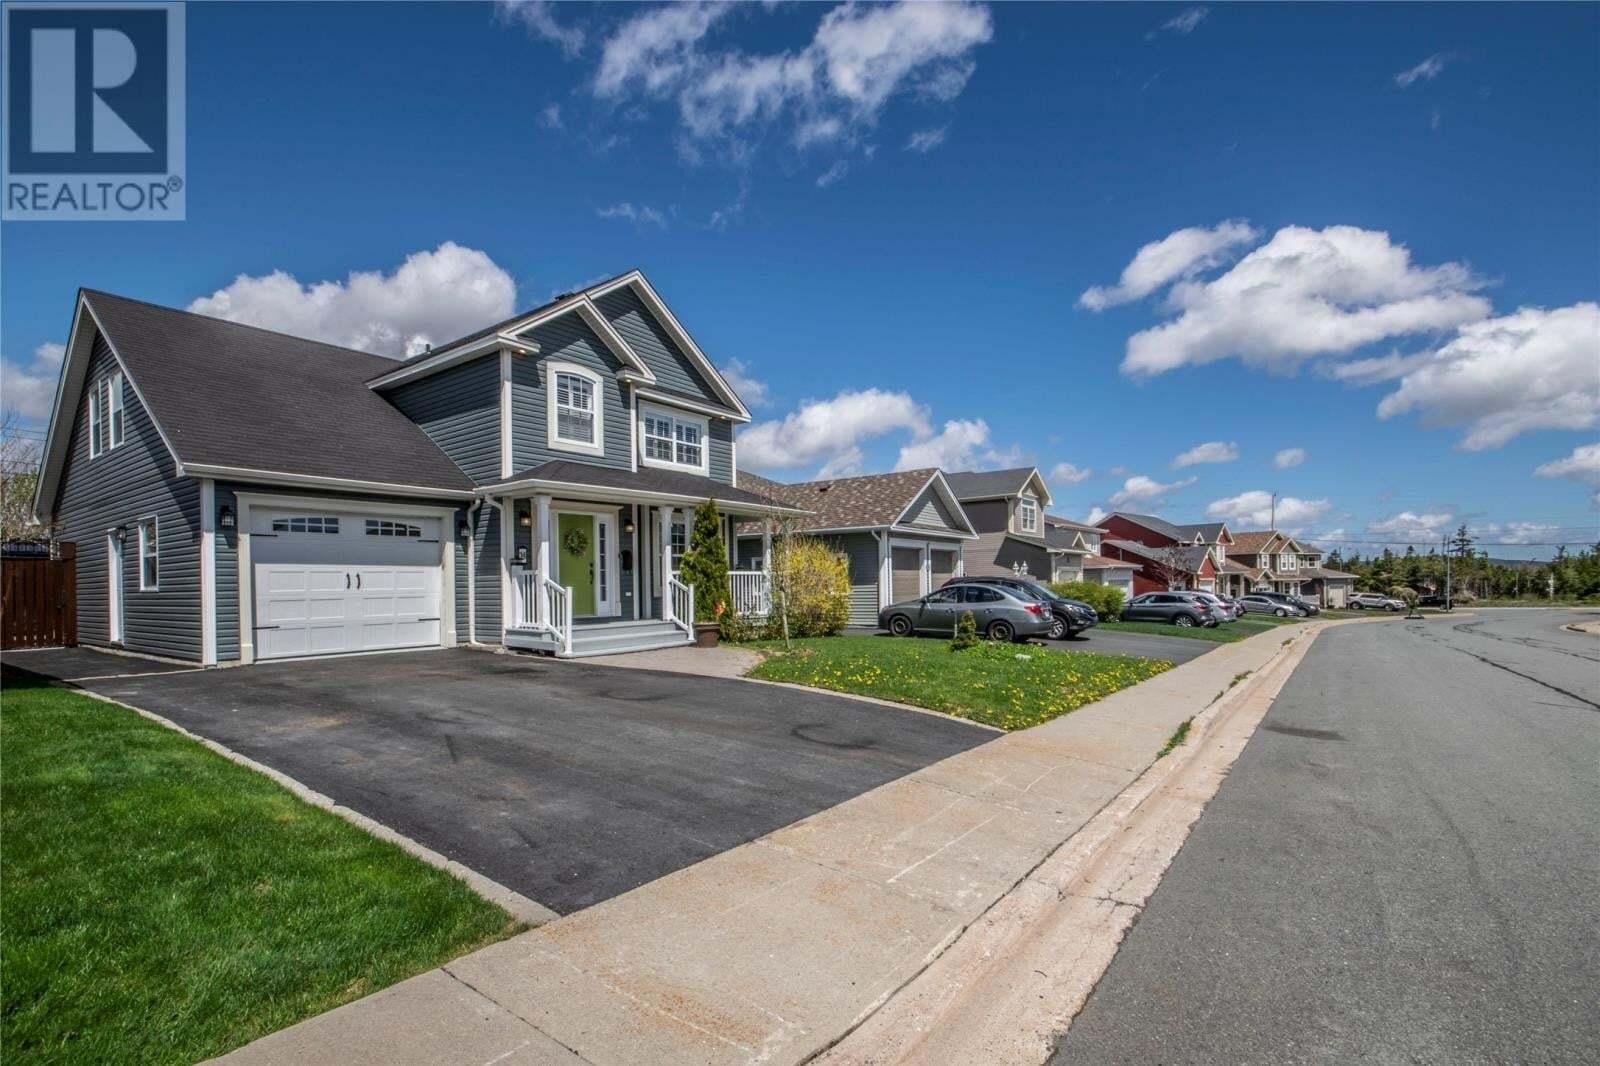 House for sale at 14 Mark Nichols Dr St. John's Newfoundland - MLS: 1214641